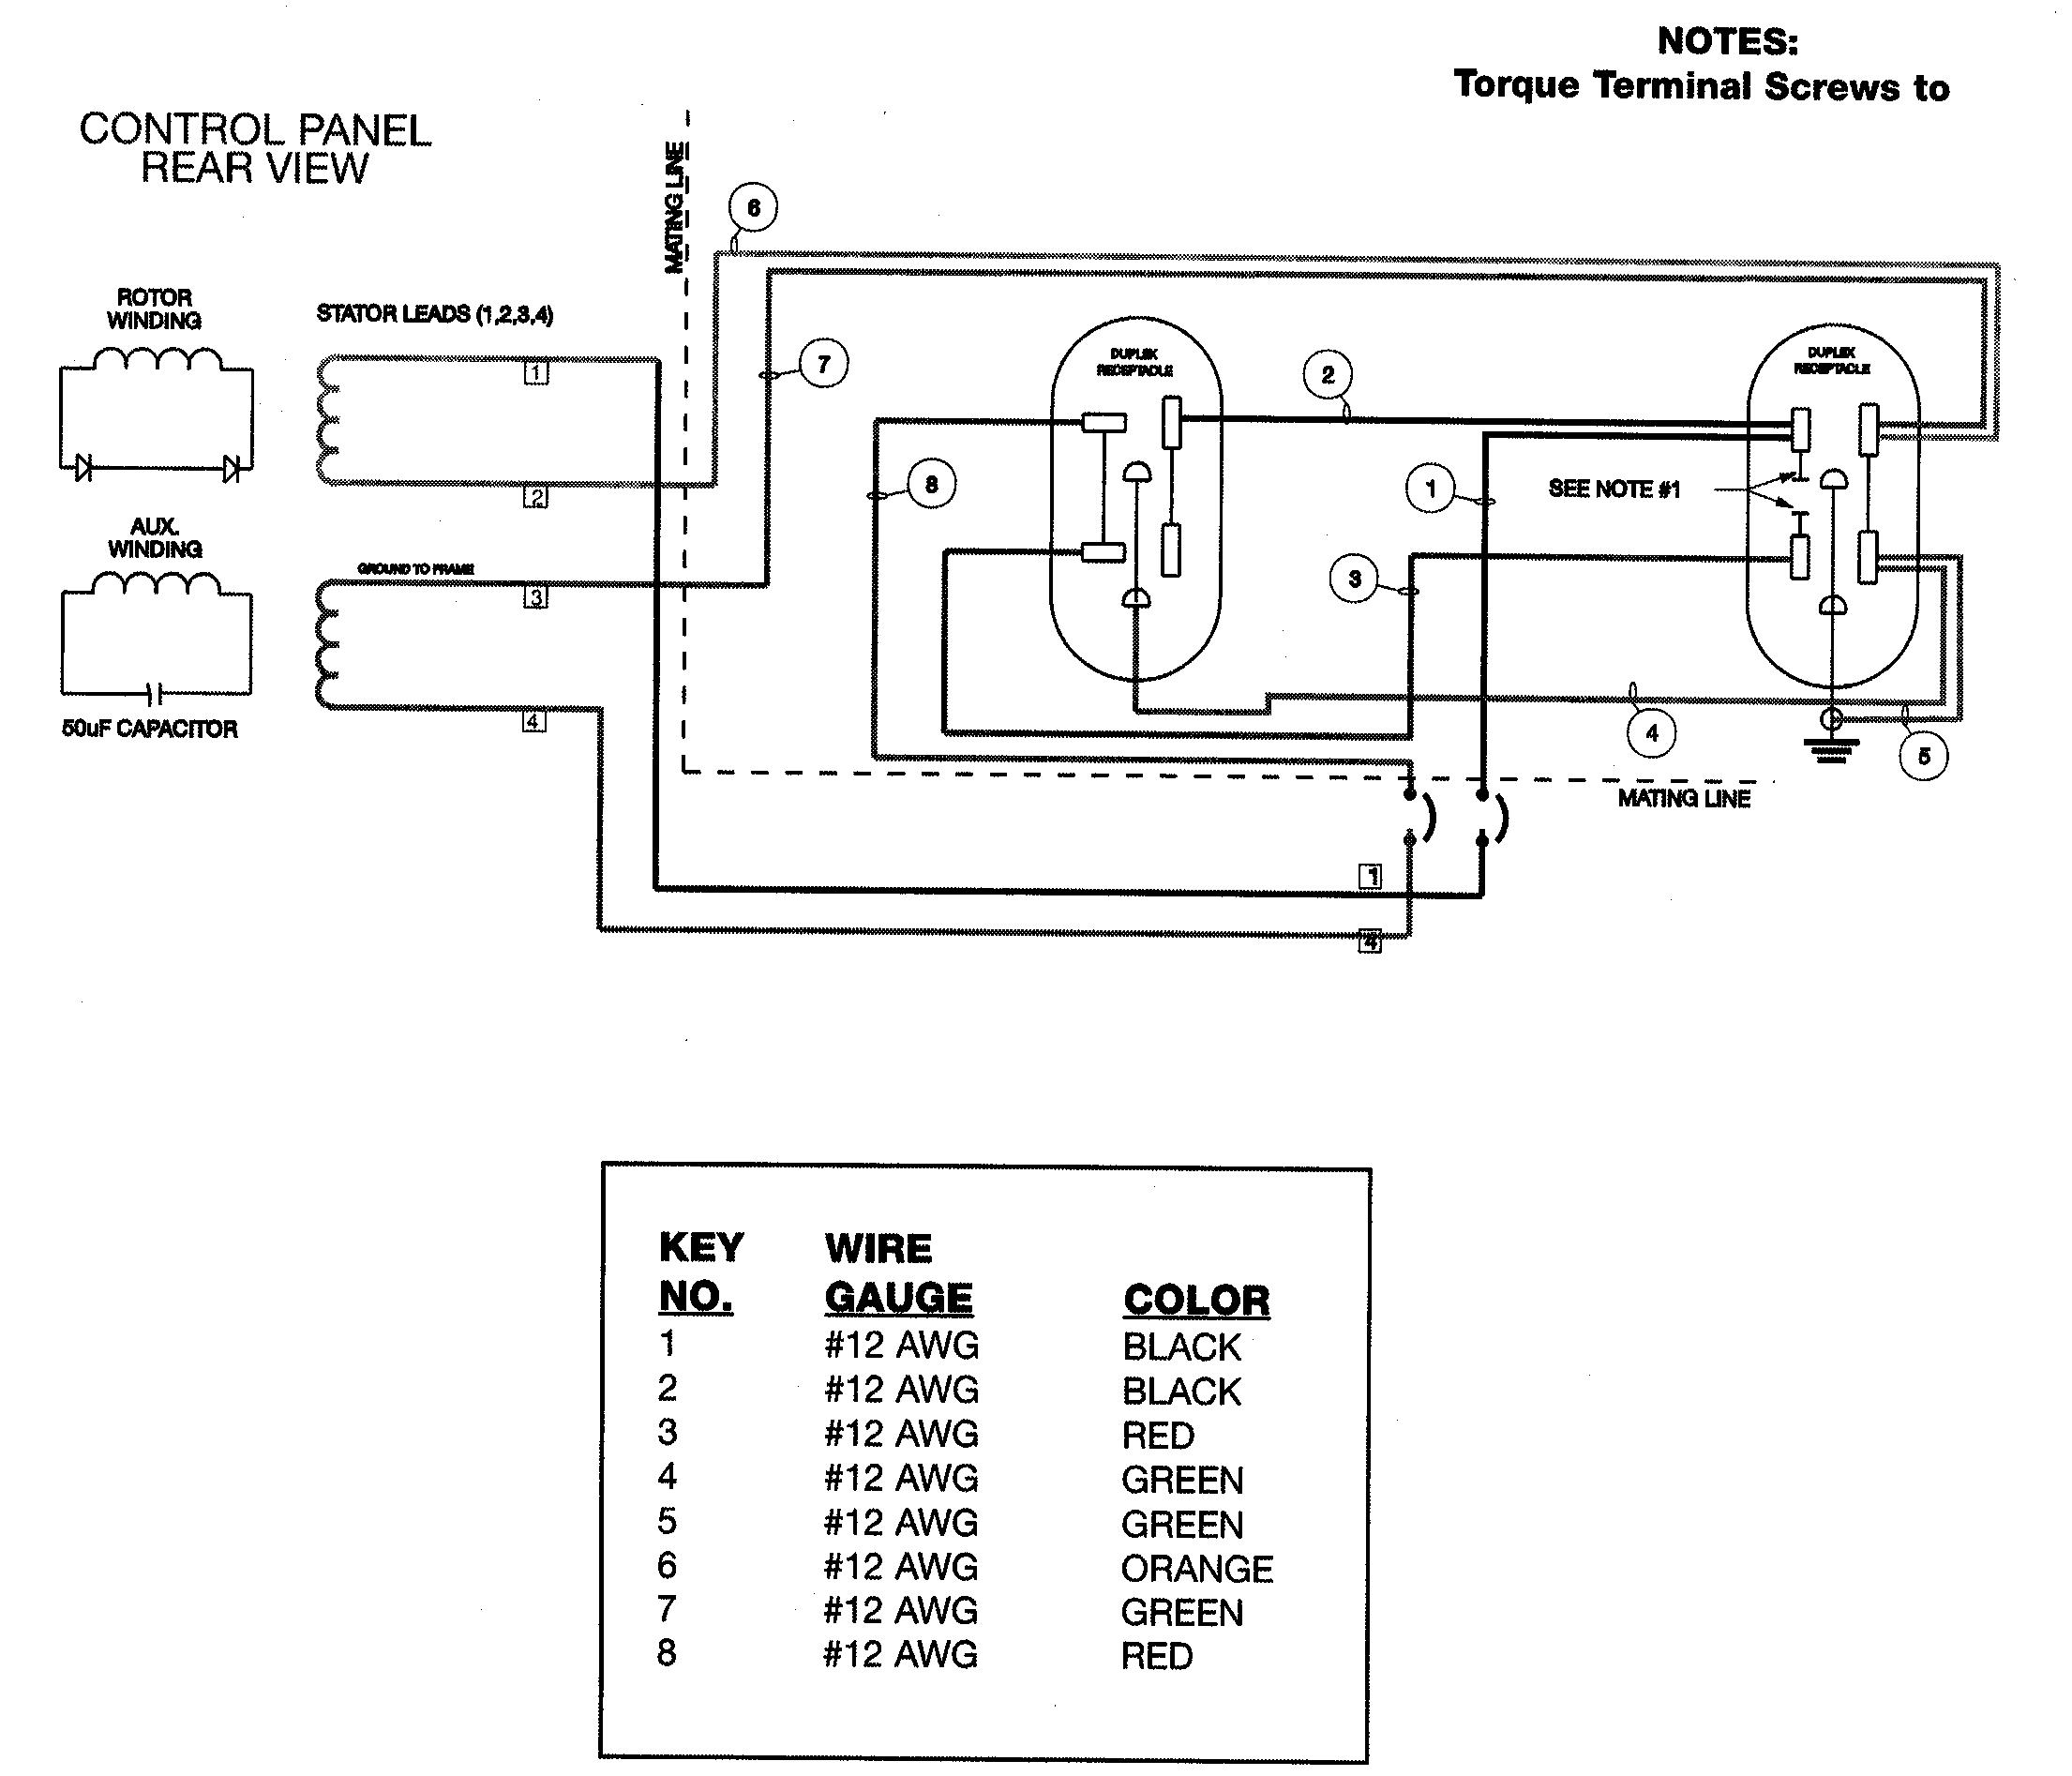 Devilbiss model GB5000-4 generator genuine parts